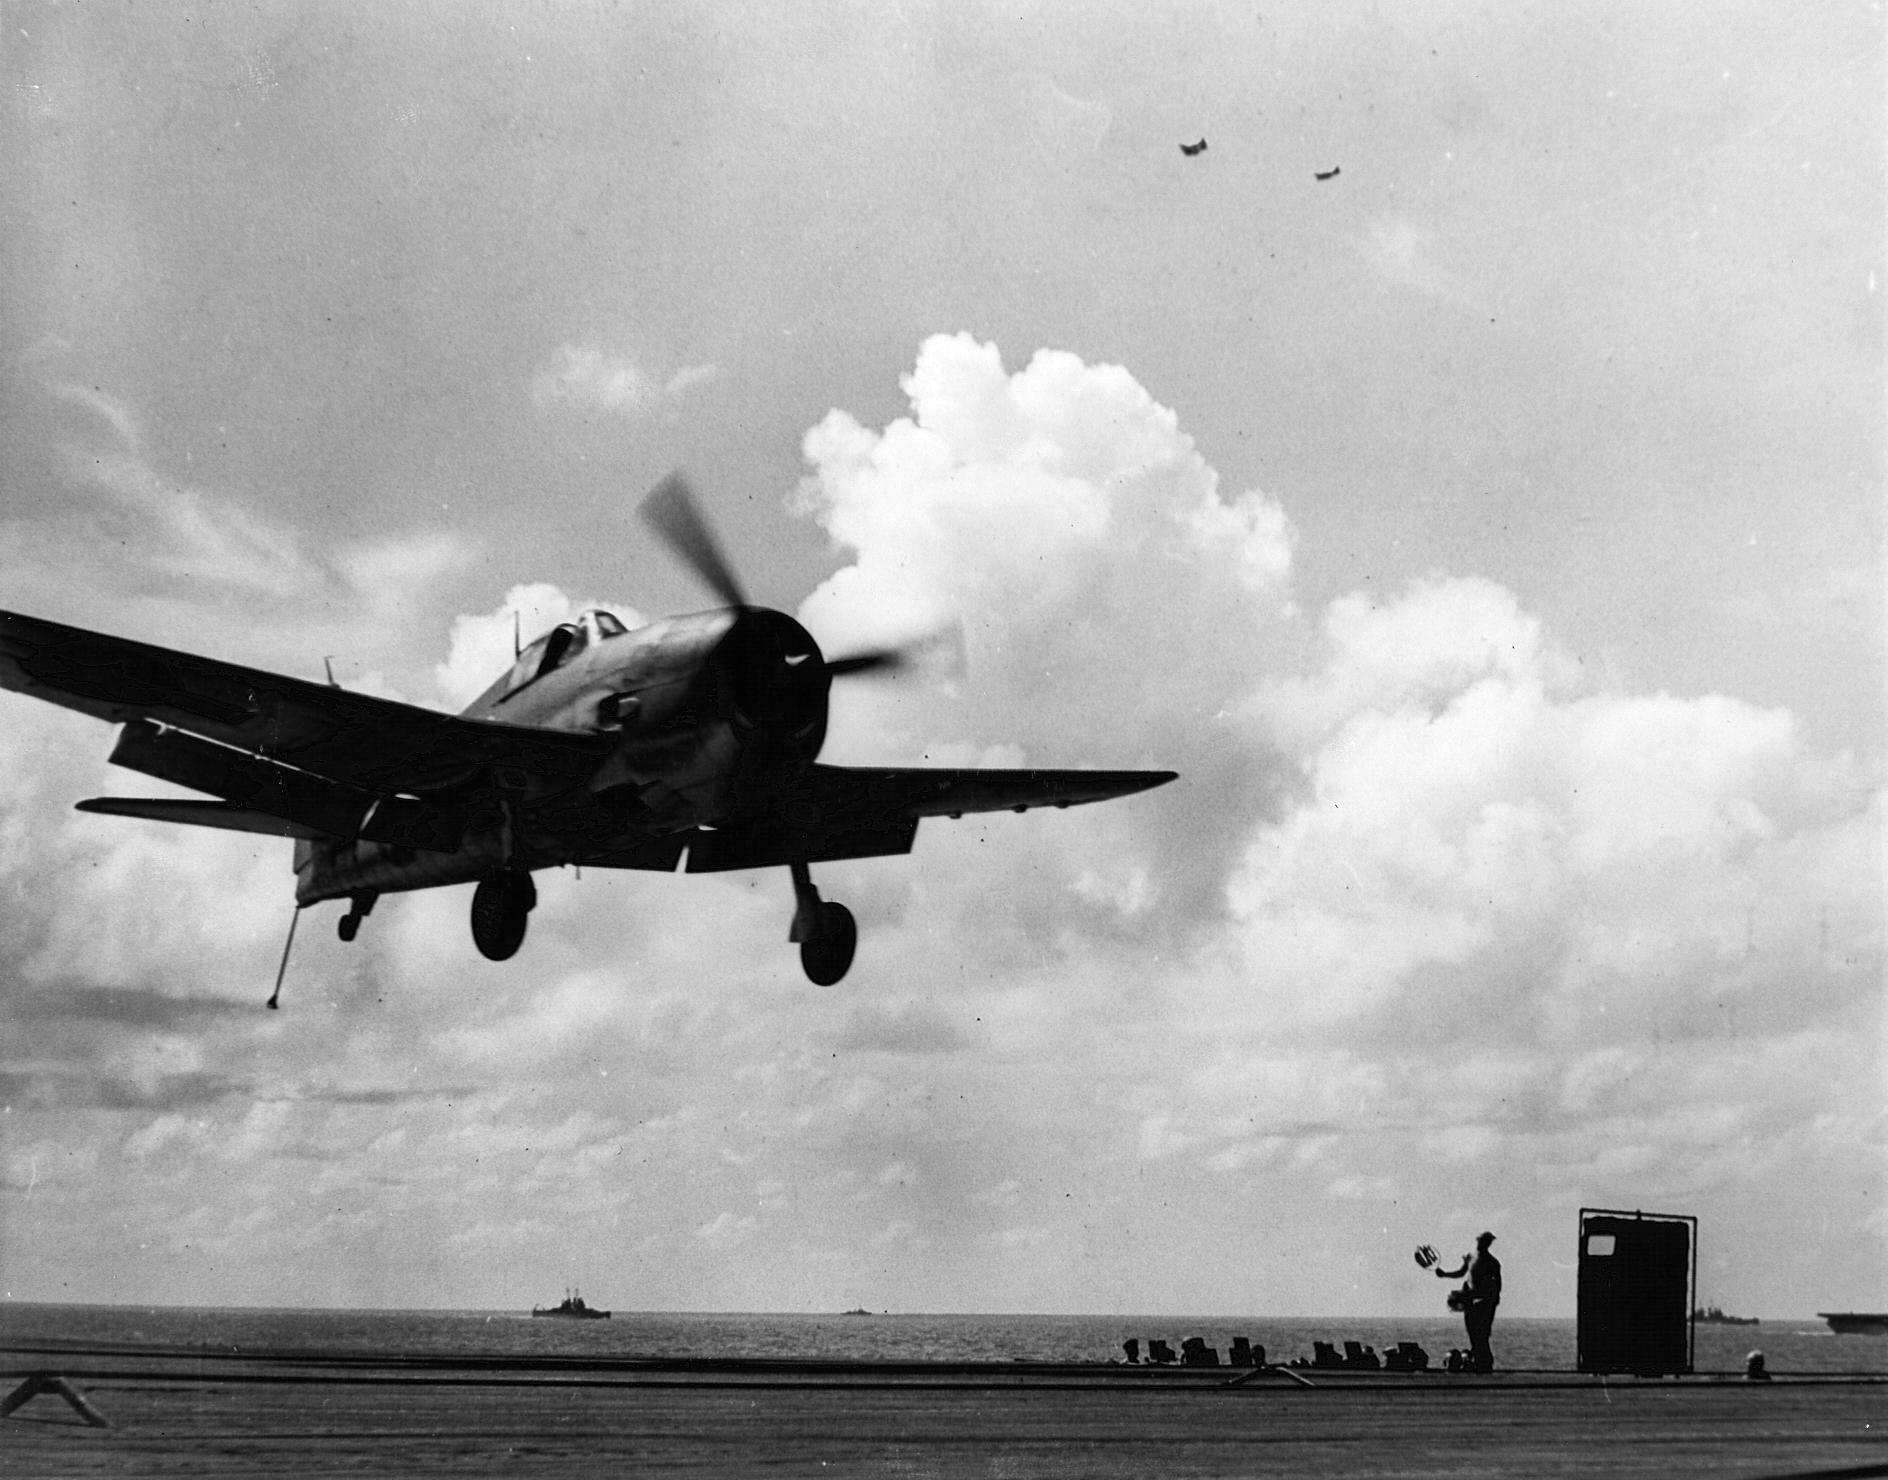 Grumman F6F 3 Hellcat VF 12 landing on the CV 3 USS Saratoga 1943 44 01